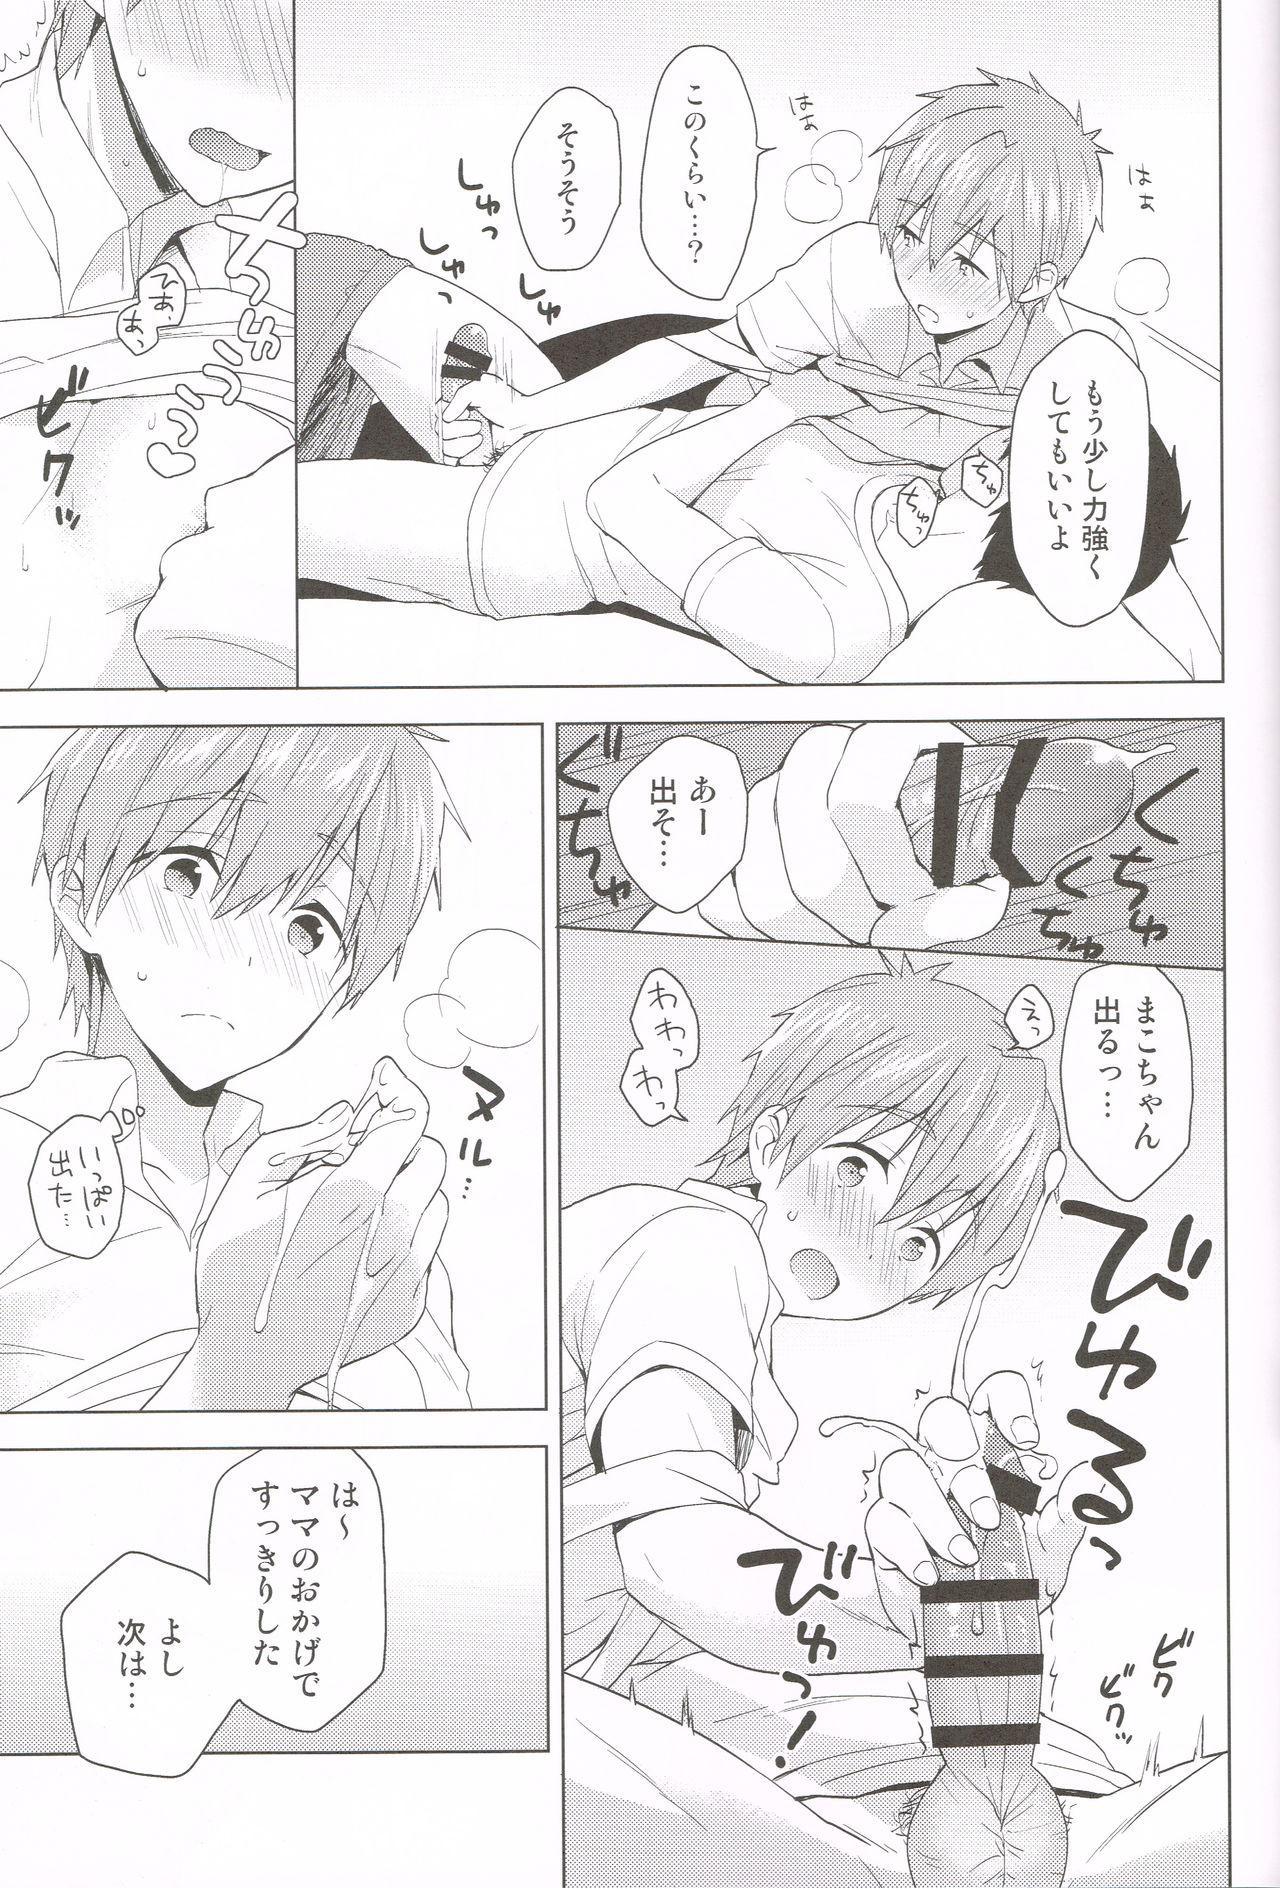 Makoto-kun to Omamagoto 9